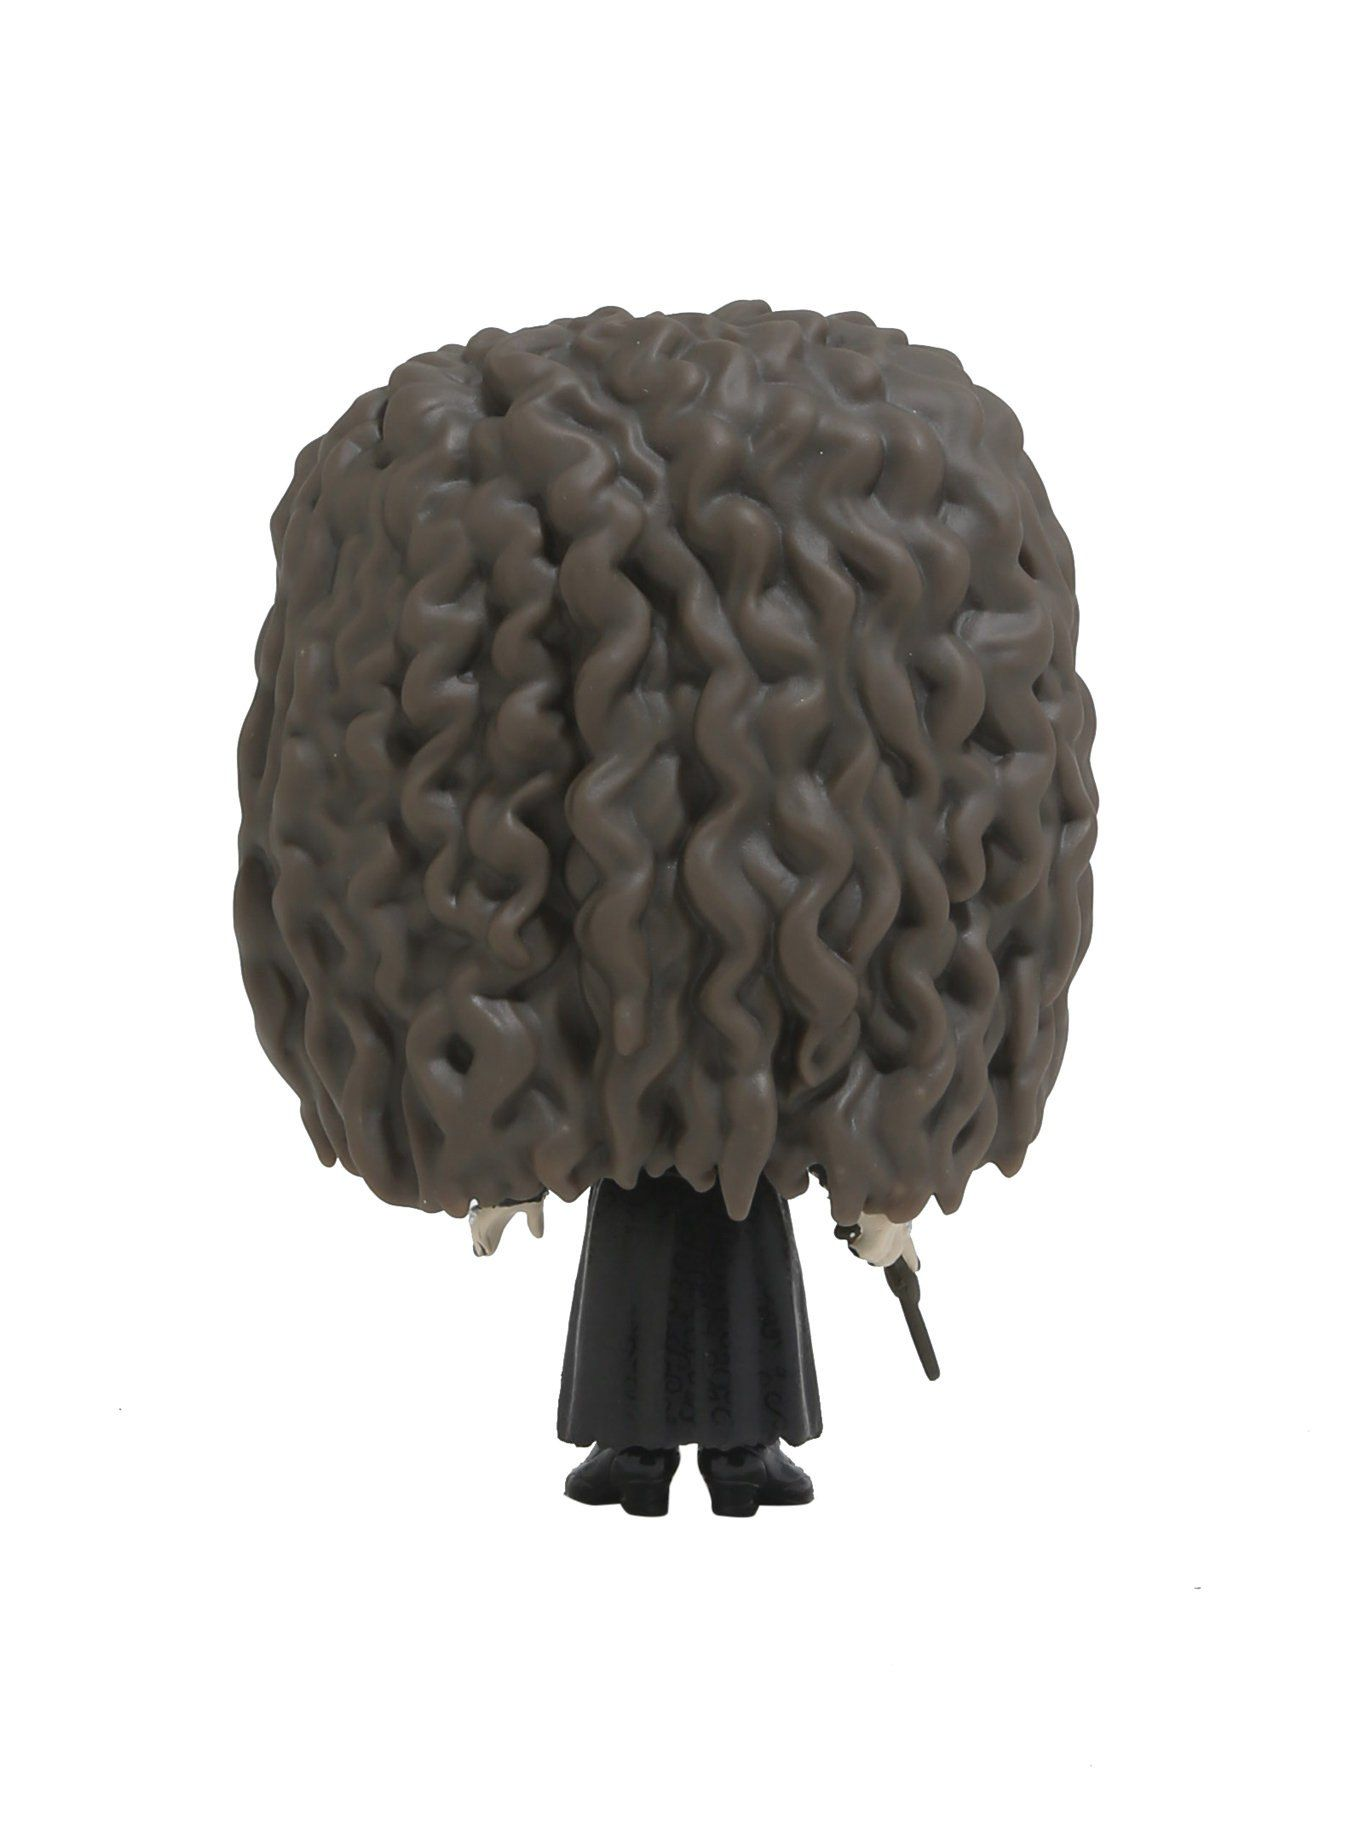 Bellatrix Lestrange #35 - Harry Potter - Funko Pop!